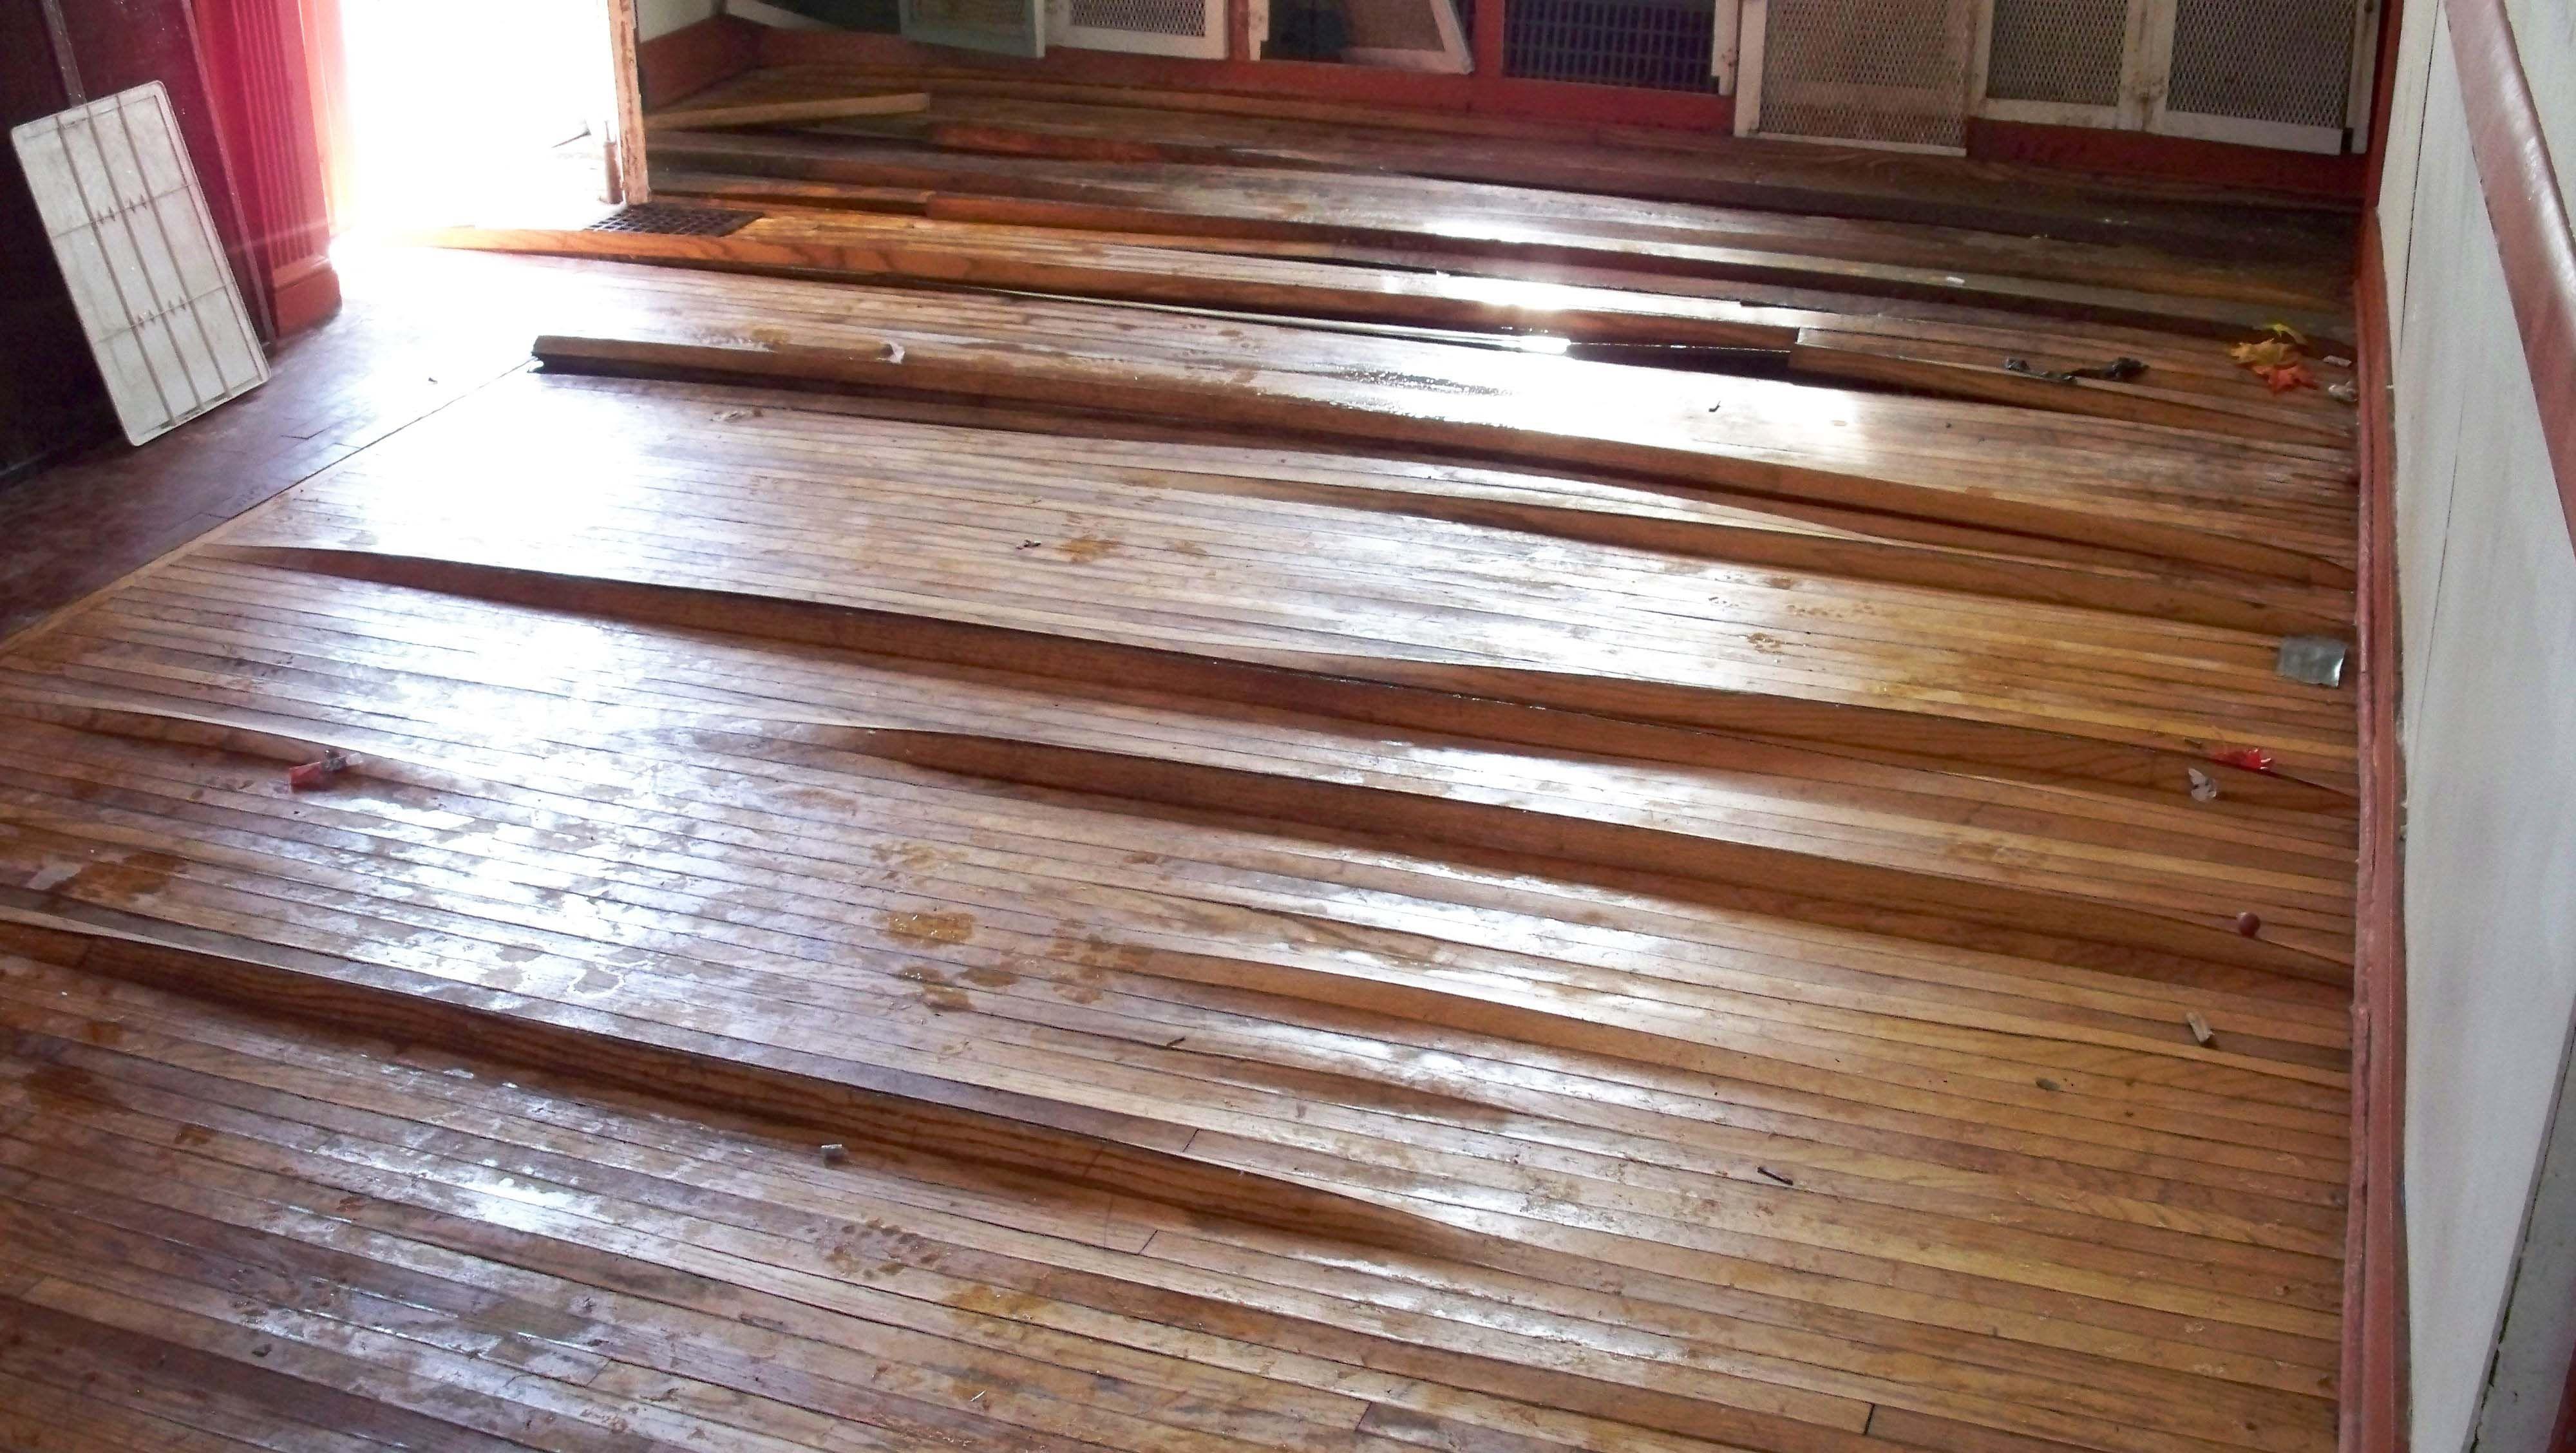 cost to refinish hardwood floors michigan of refinish hardwood floors diy floor within refinish hardwood floors diy hardwood floor water damage warping hardwood floors